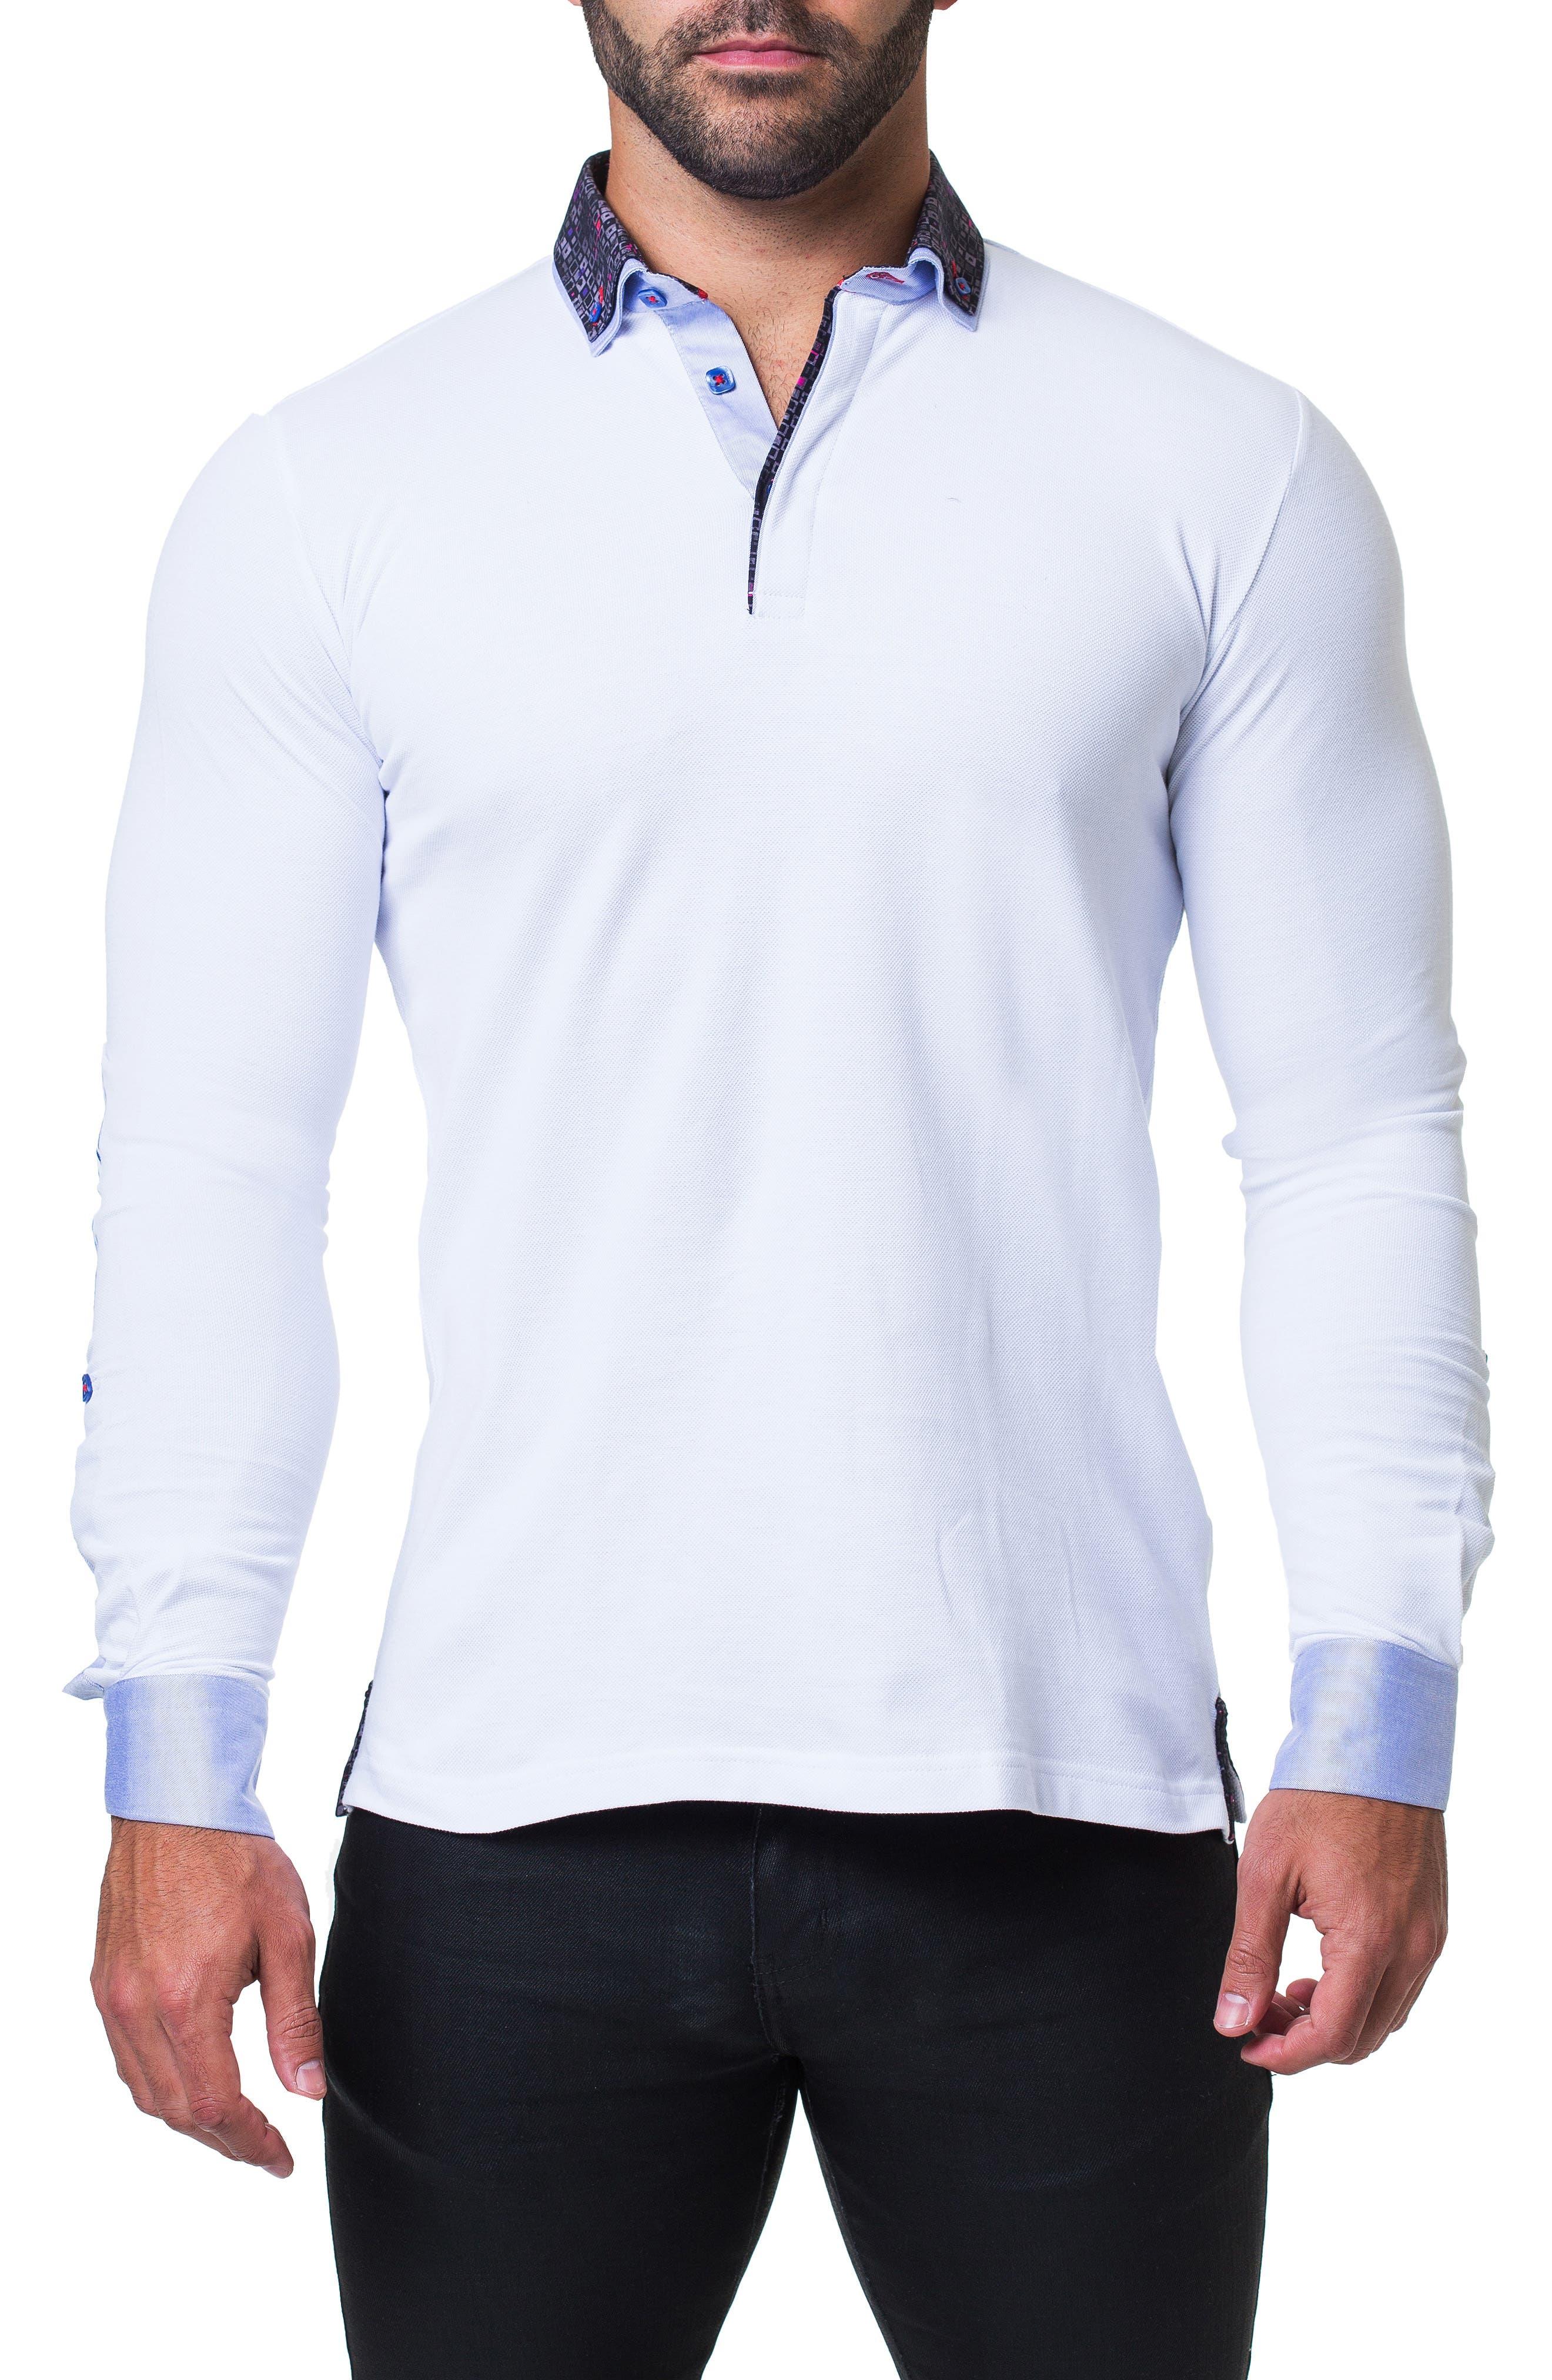 Newton Trim Fit Long Sleeve Polo,                             Main thumbnail 1, color,                             WHITE